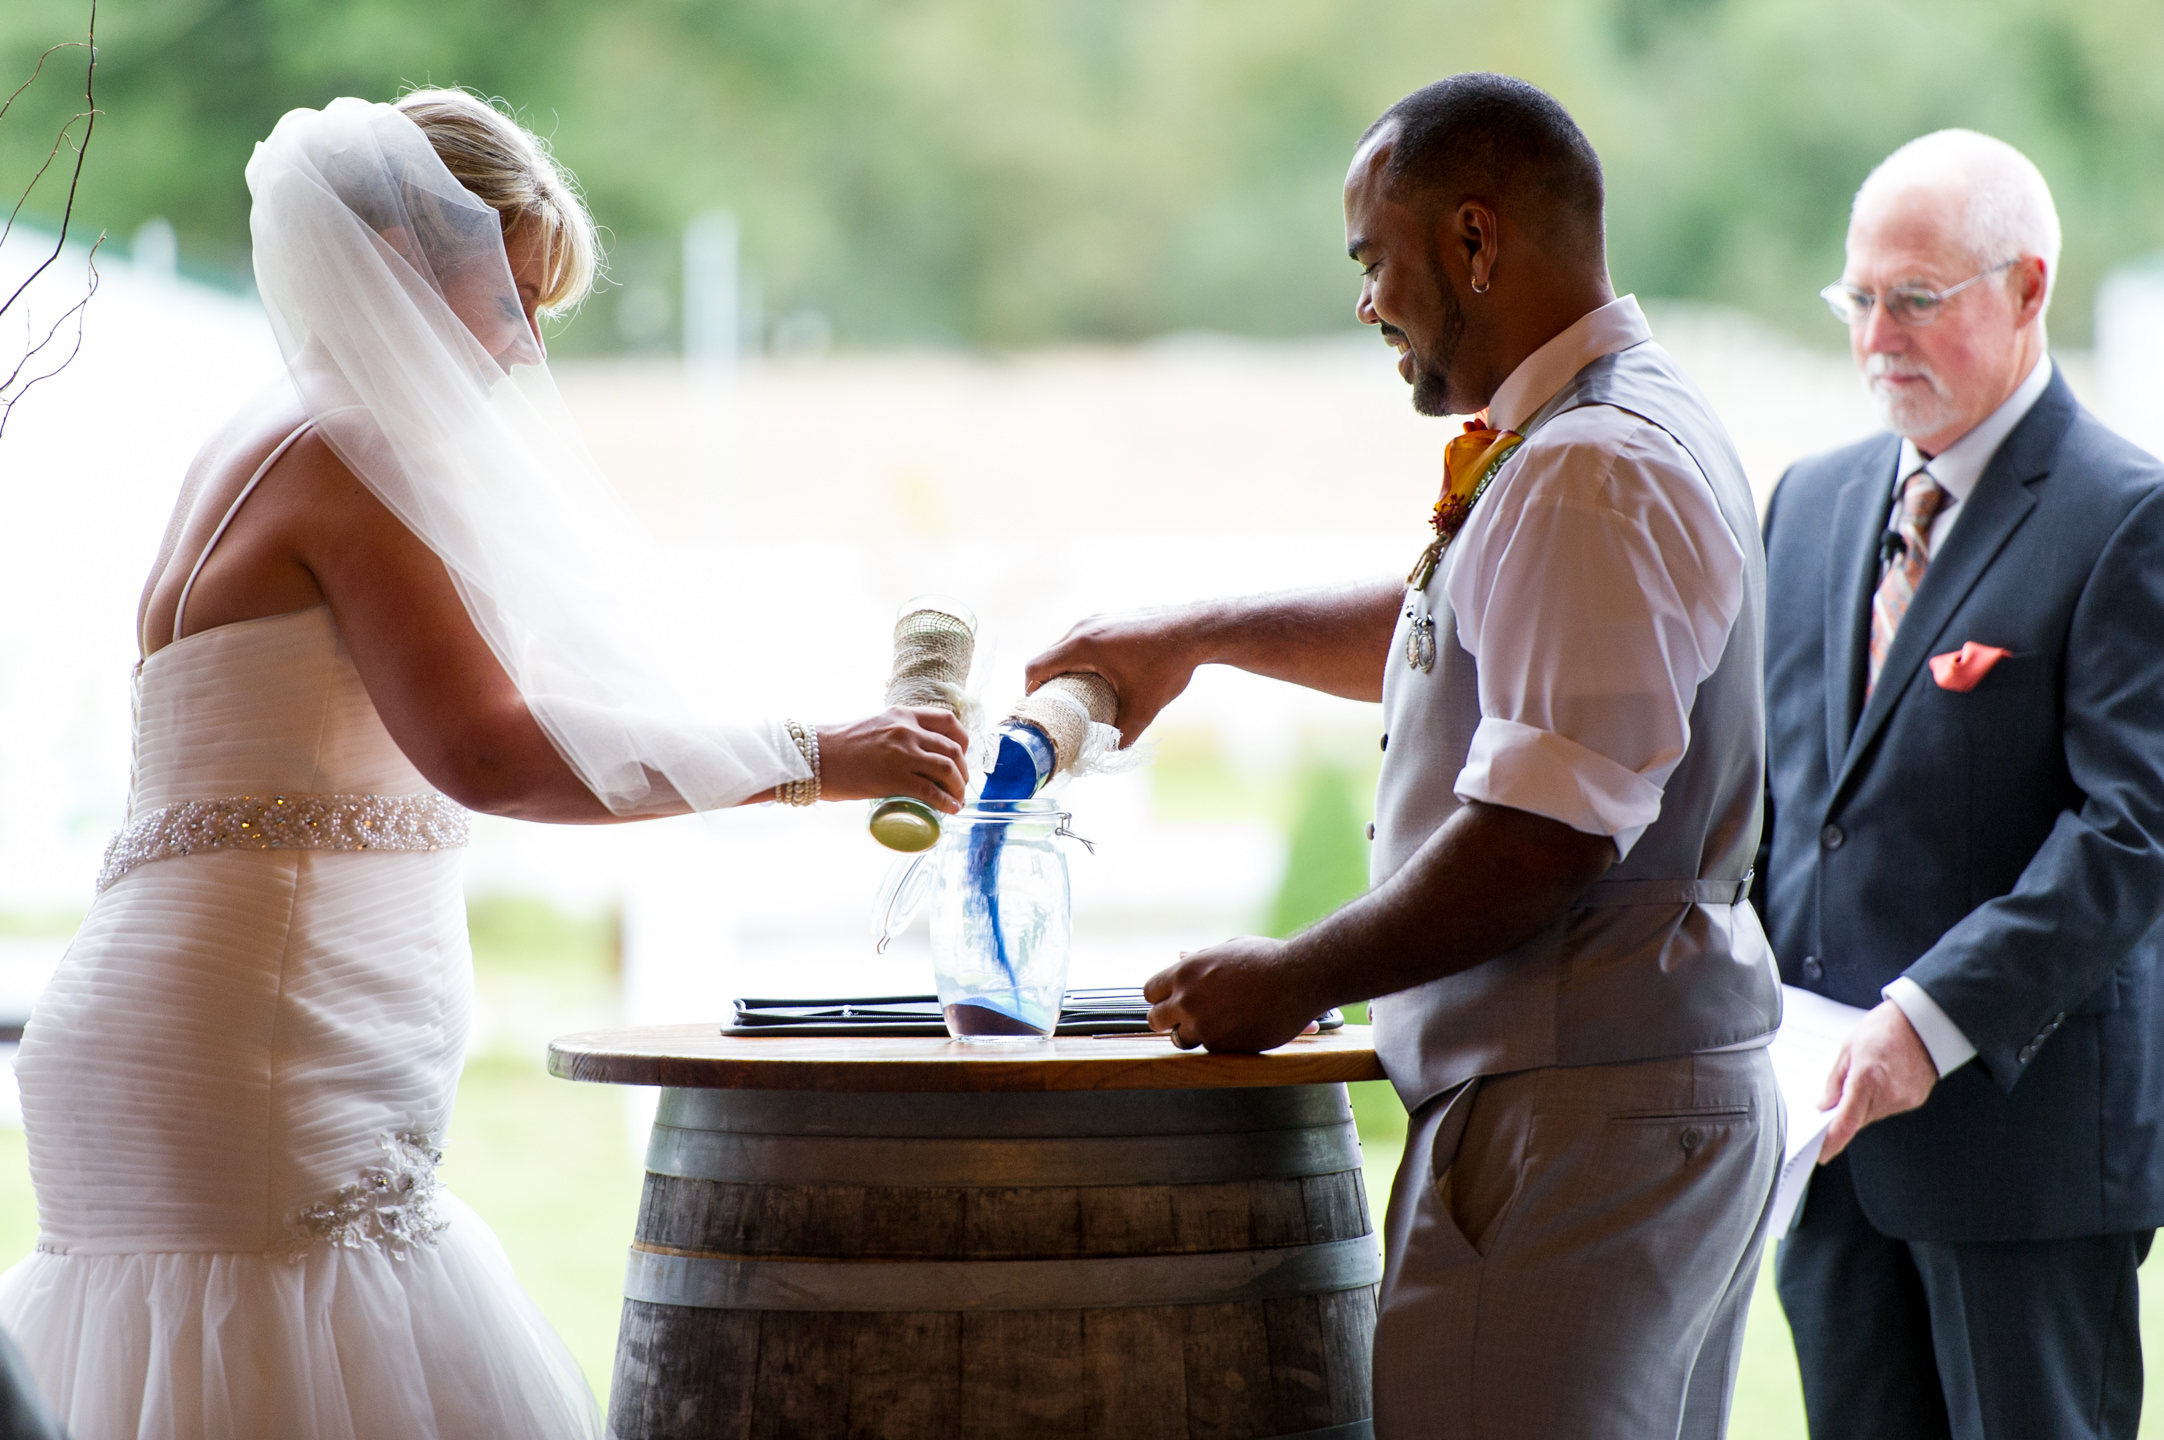 20160917_Tat_Renee and Marcus Wedding-45.jpg